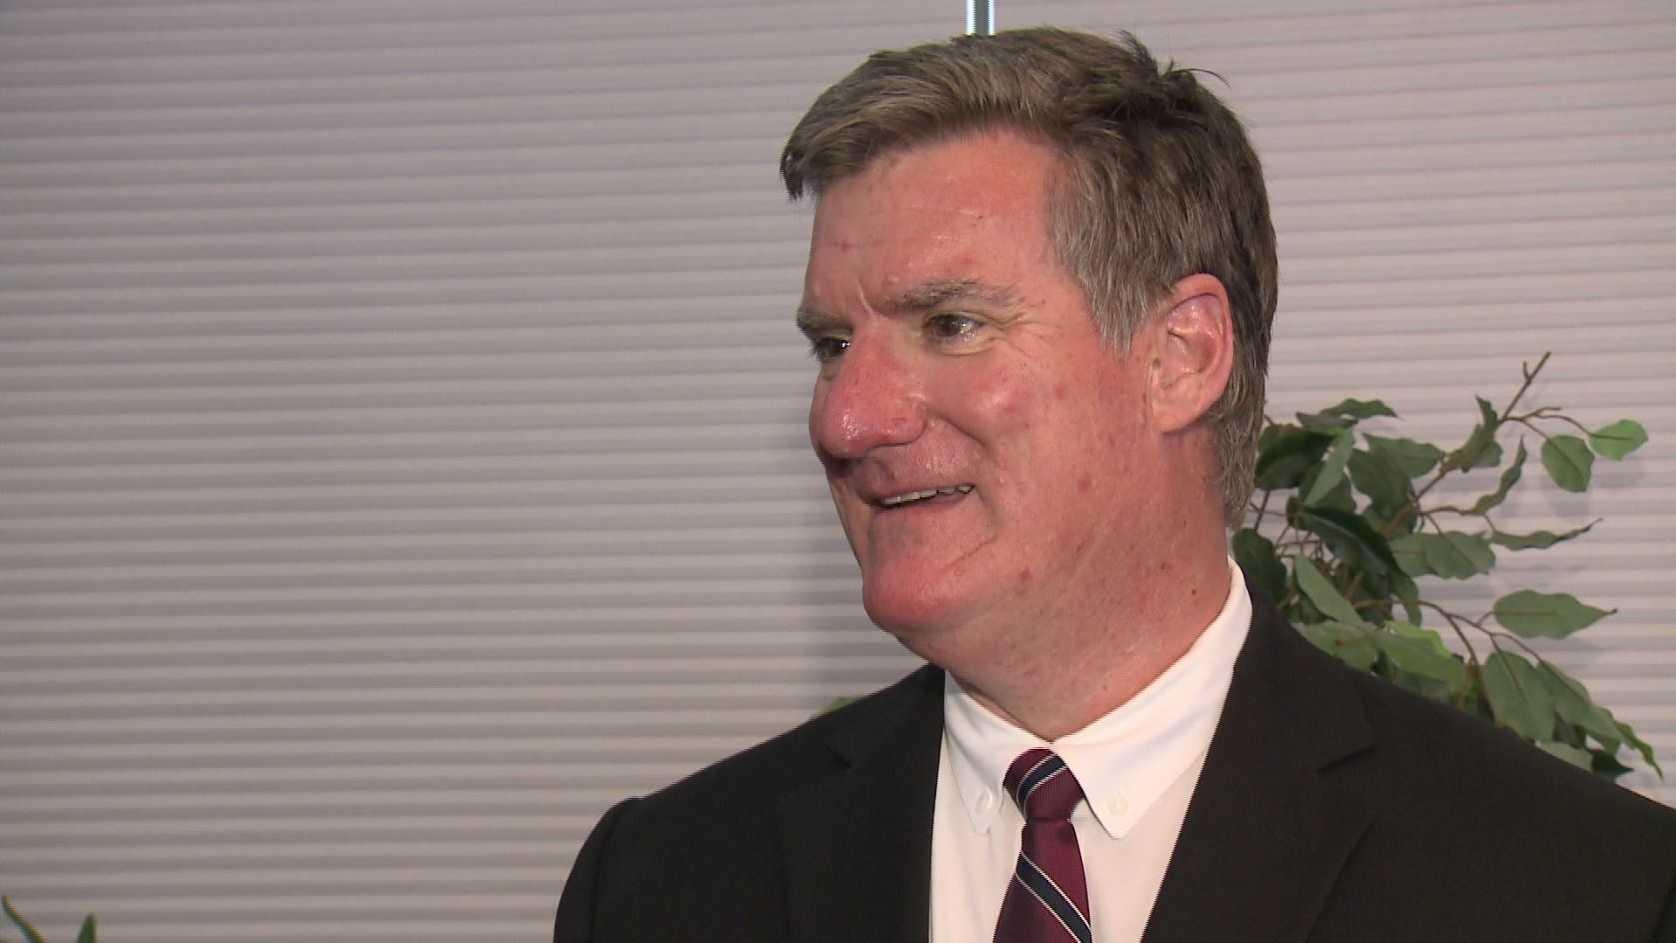 State Sen. Andy Sanborn